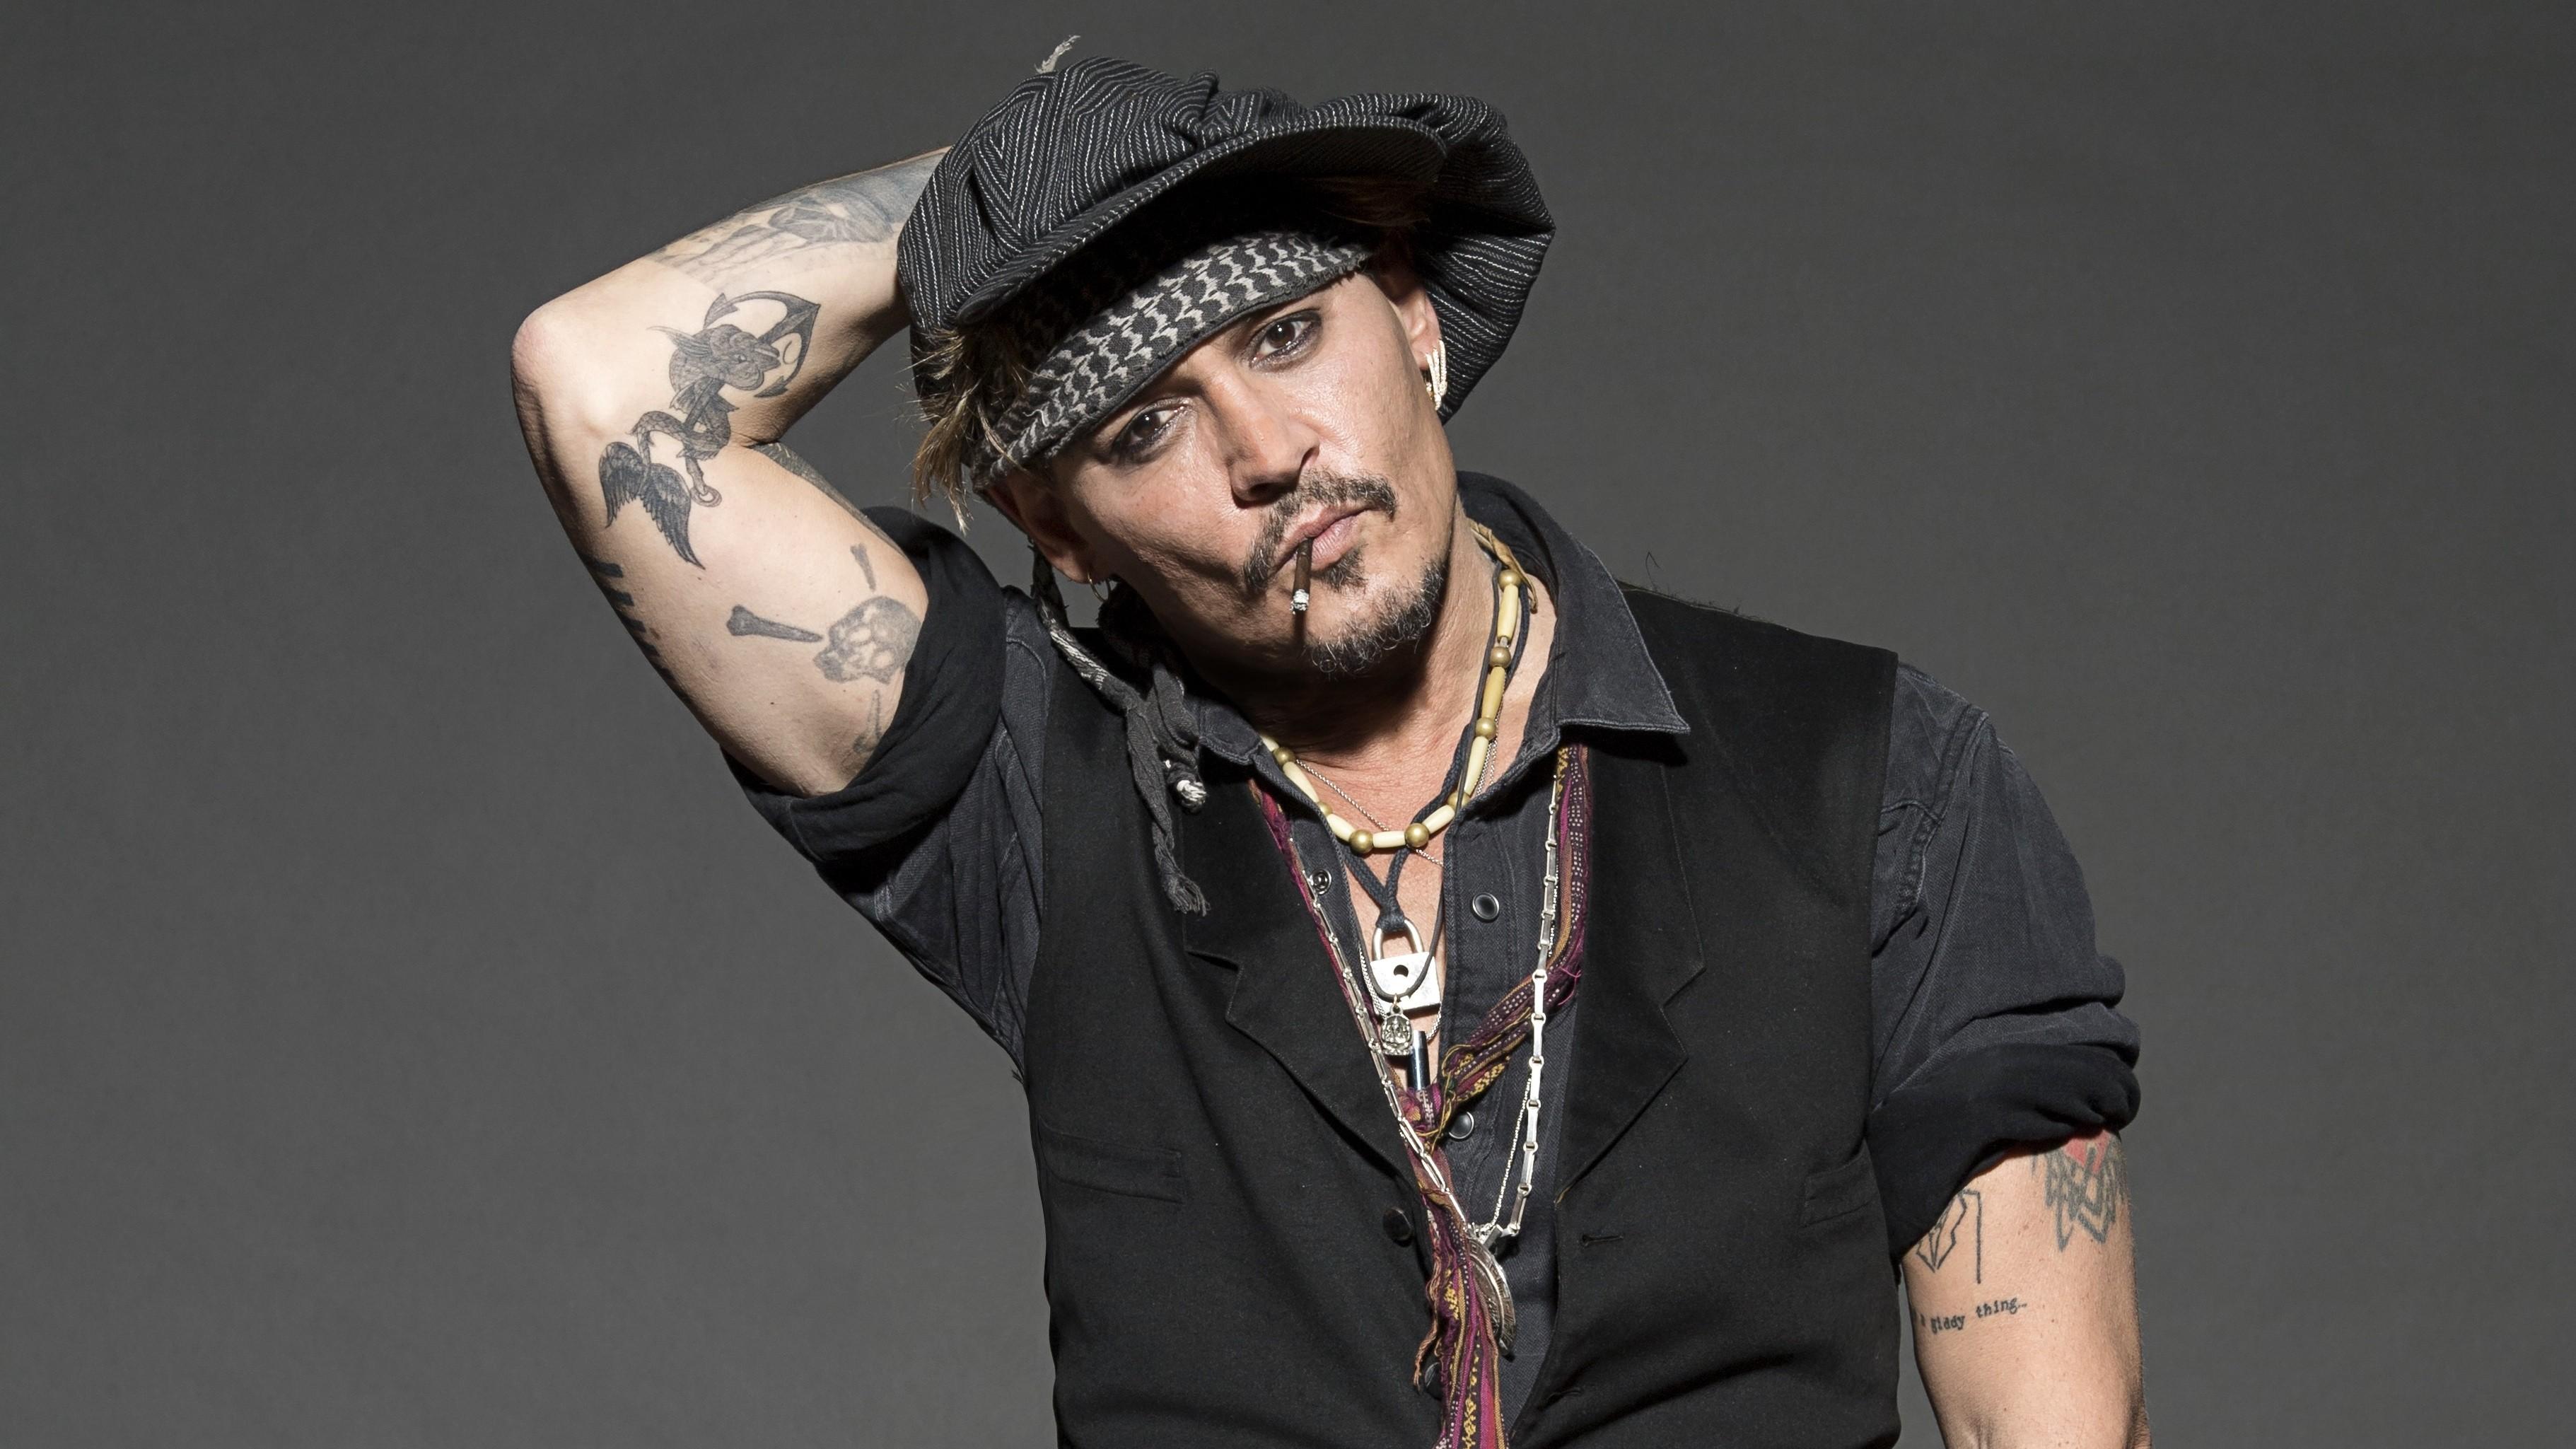 Classic Rock Magazine intervista Johnny Depp | IFOD ...